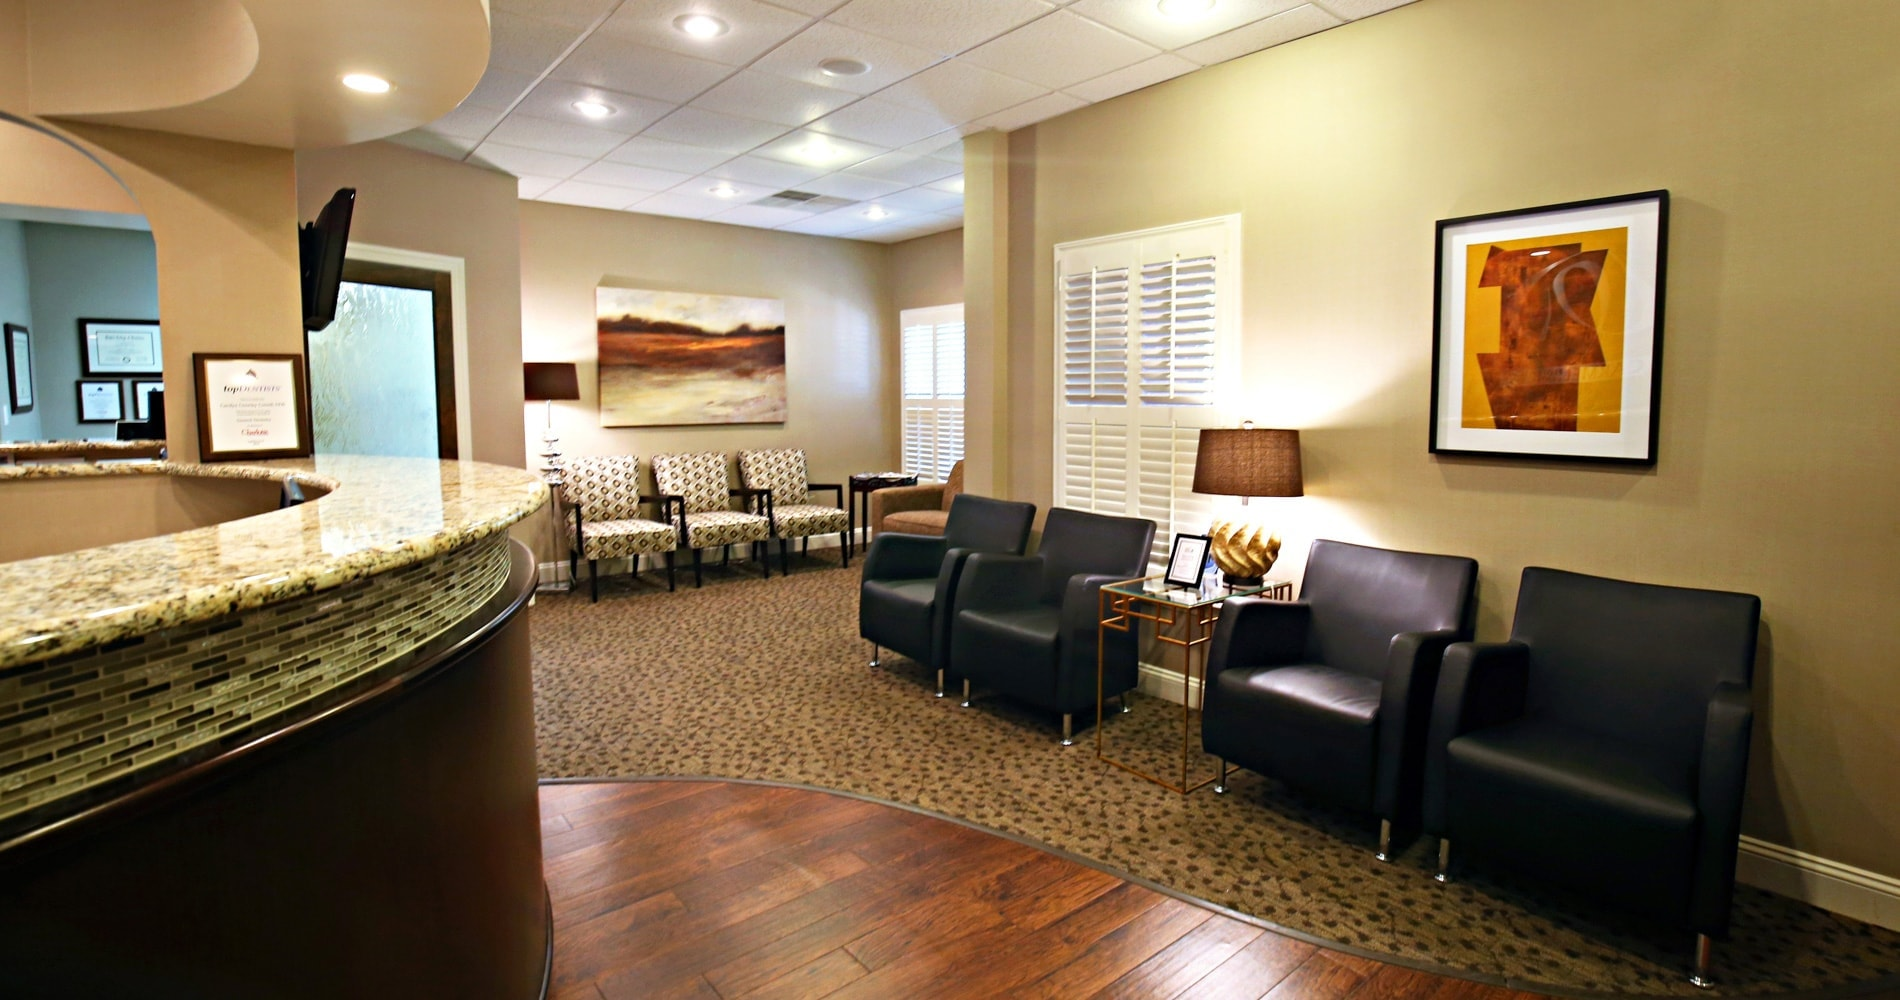 Front desk waiting room at Carmel Professional Dentistry